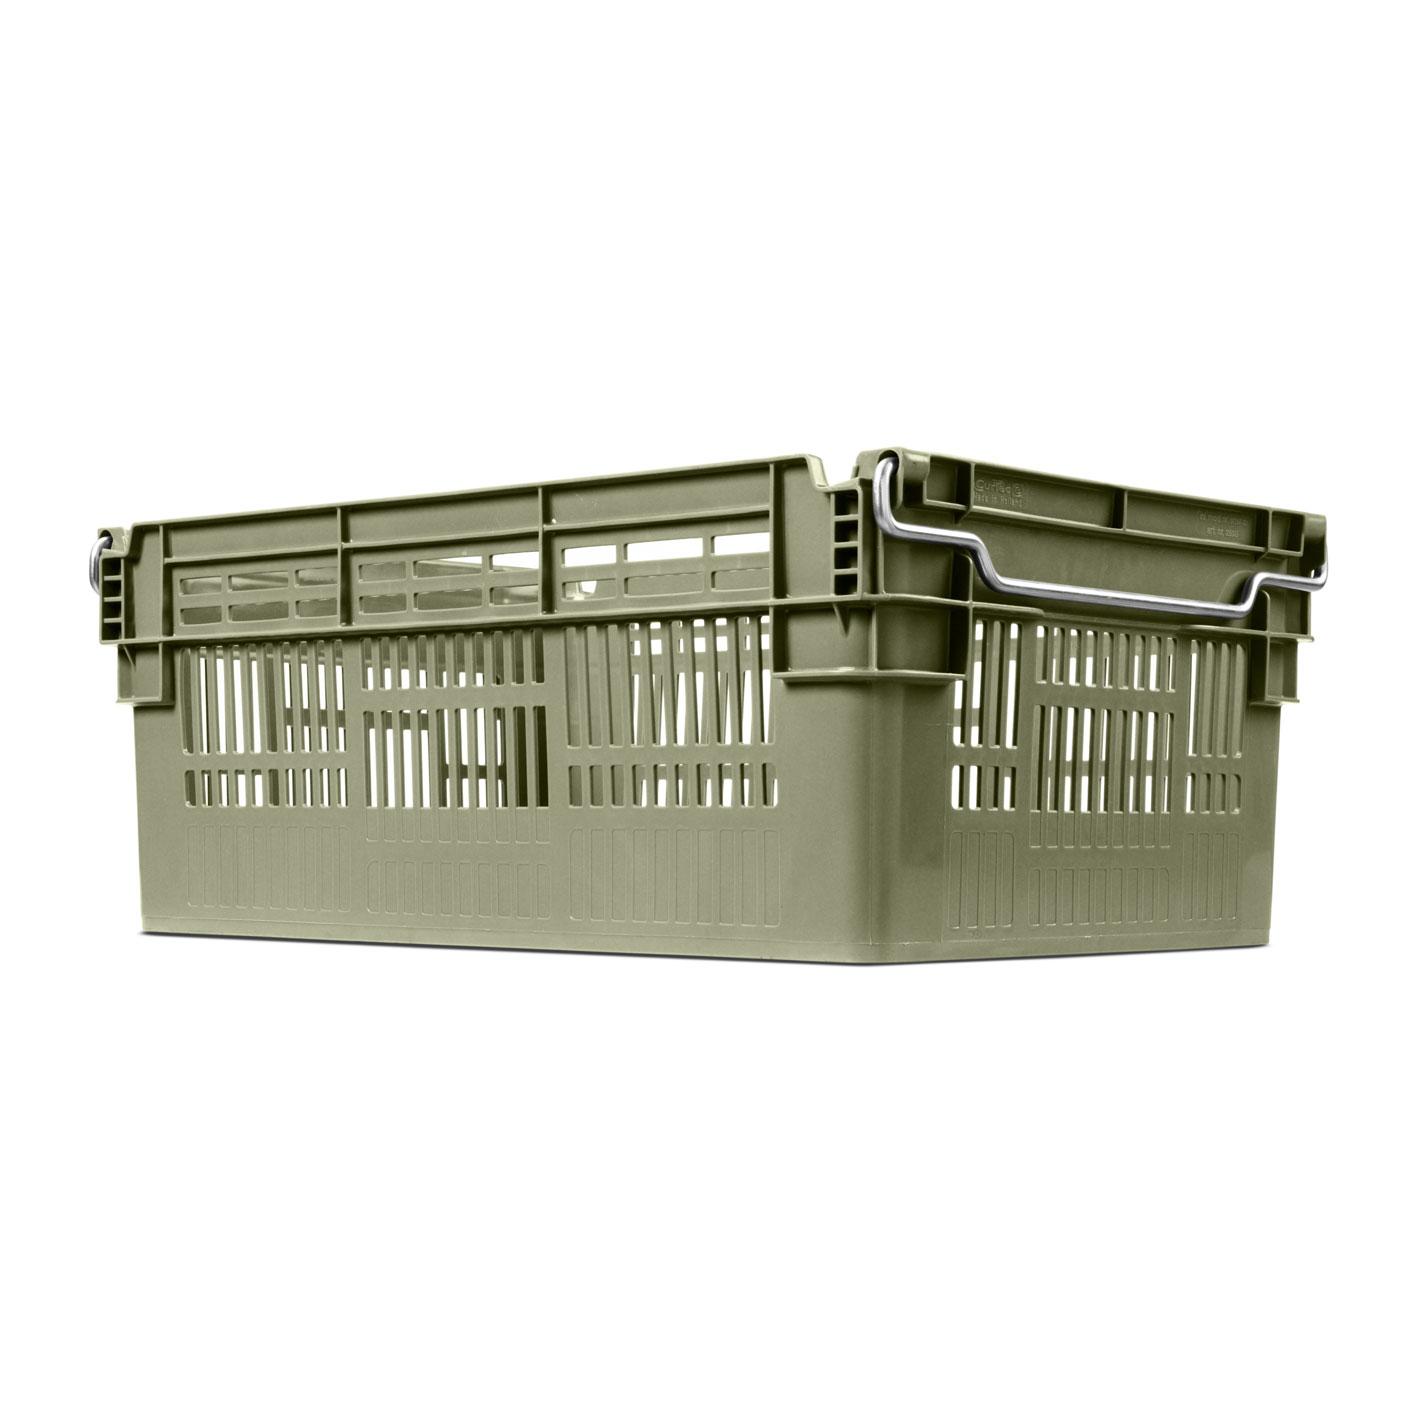 45 litre swingbar crate